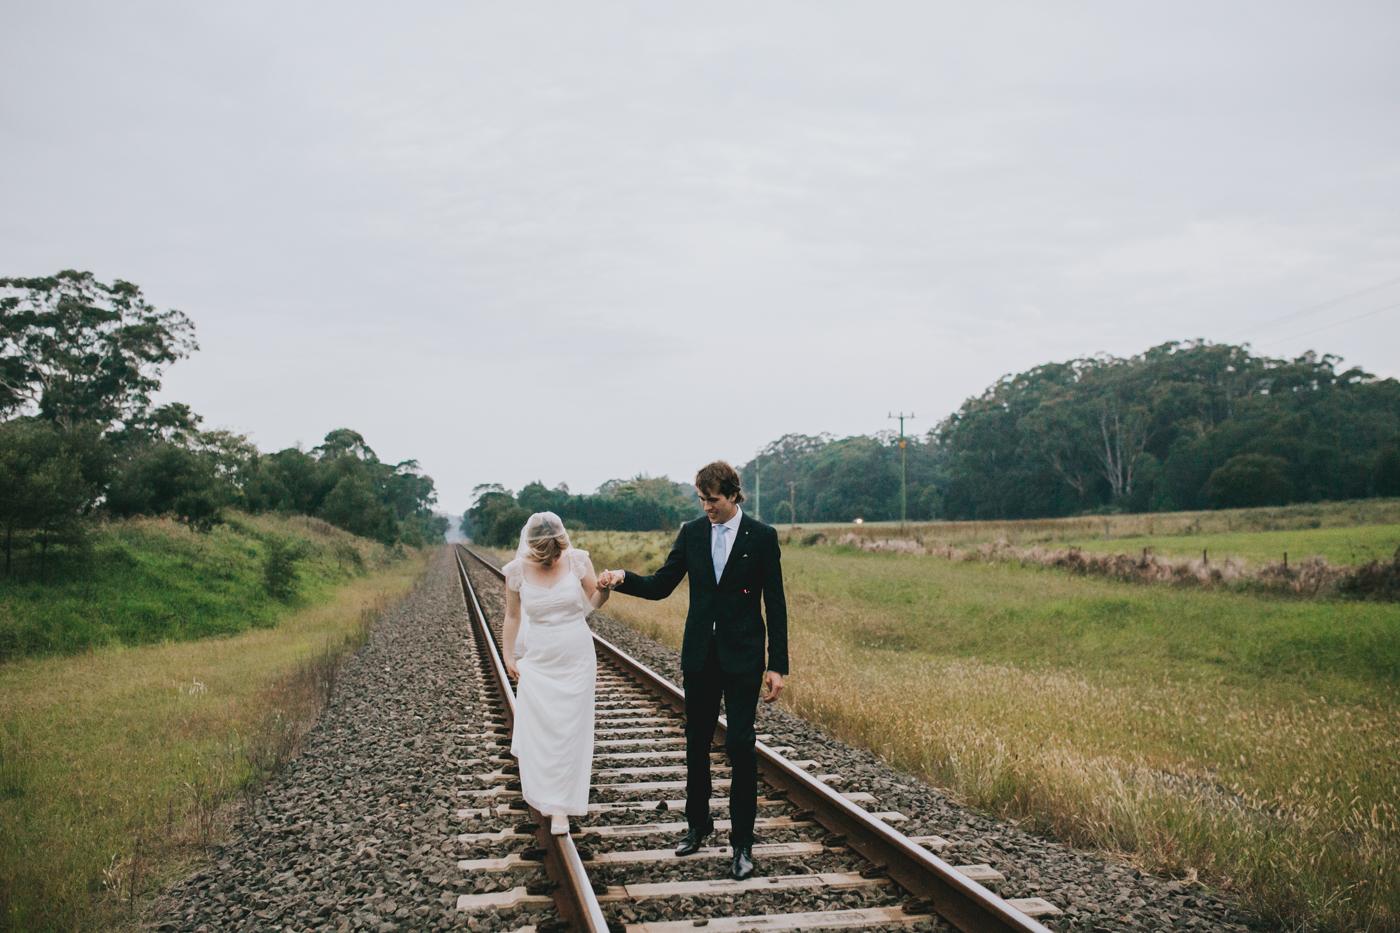 Rachel & Jacob - Willow Farm Berry - South Coast Wedding - Samantha Heather Photography-169.jpg